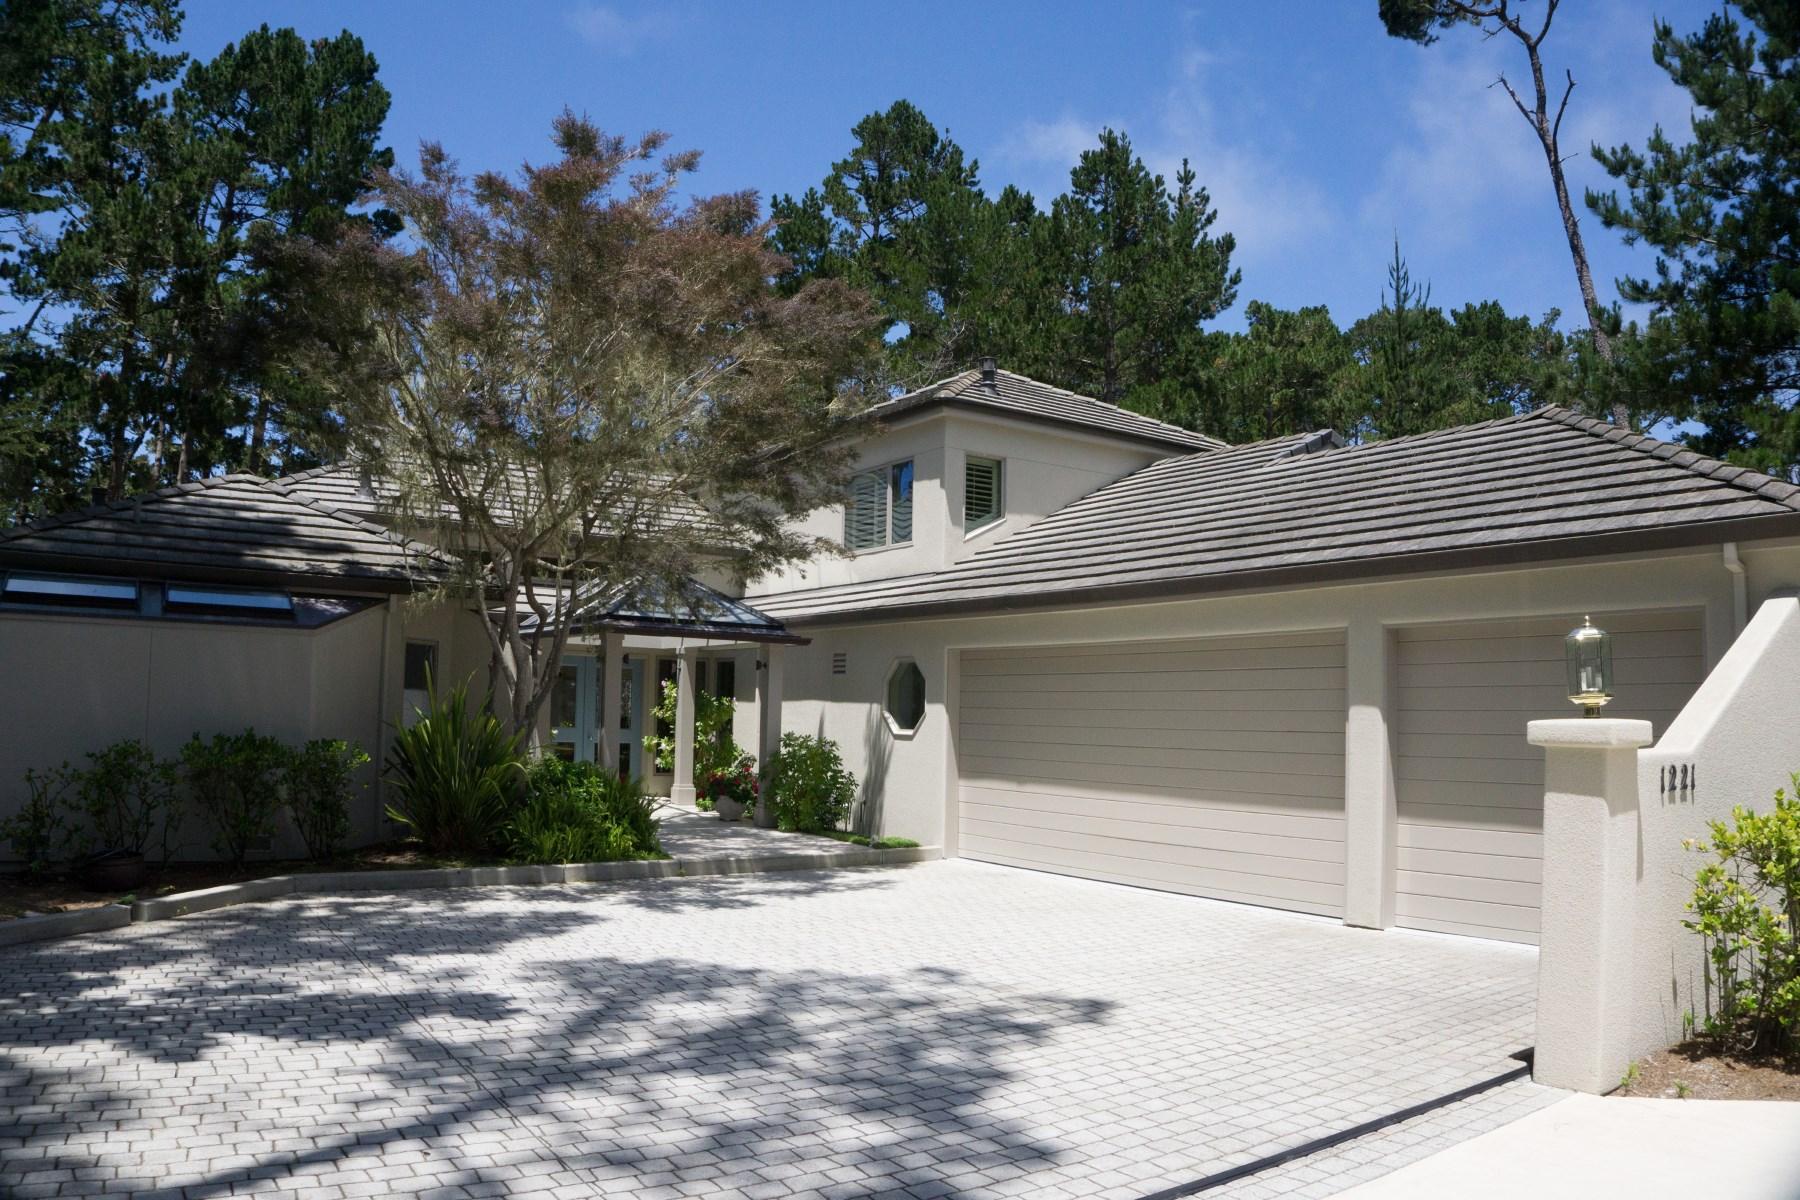 Single Family Home for Sale at 1221 Bristol Lane Pebble Beach Pebble Beach, California, 93953 United States